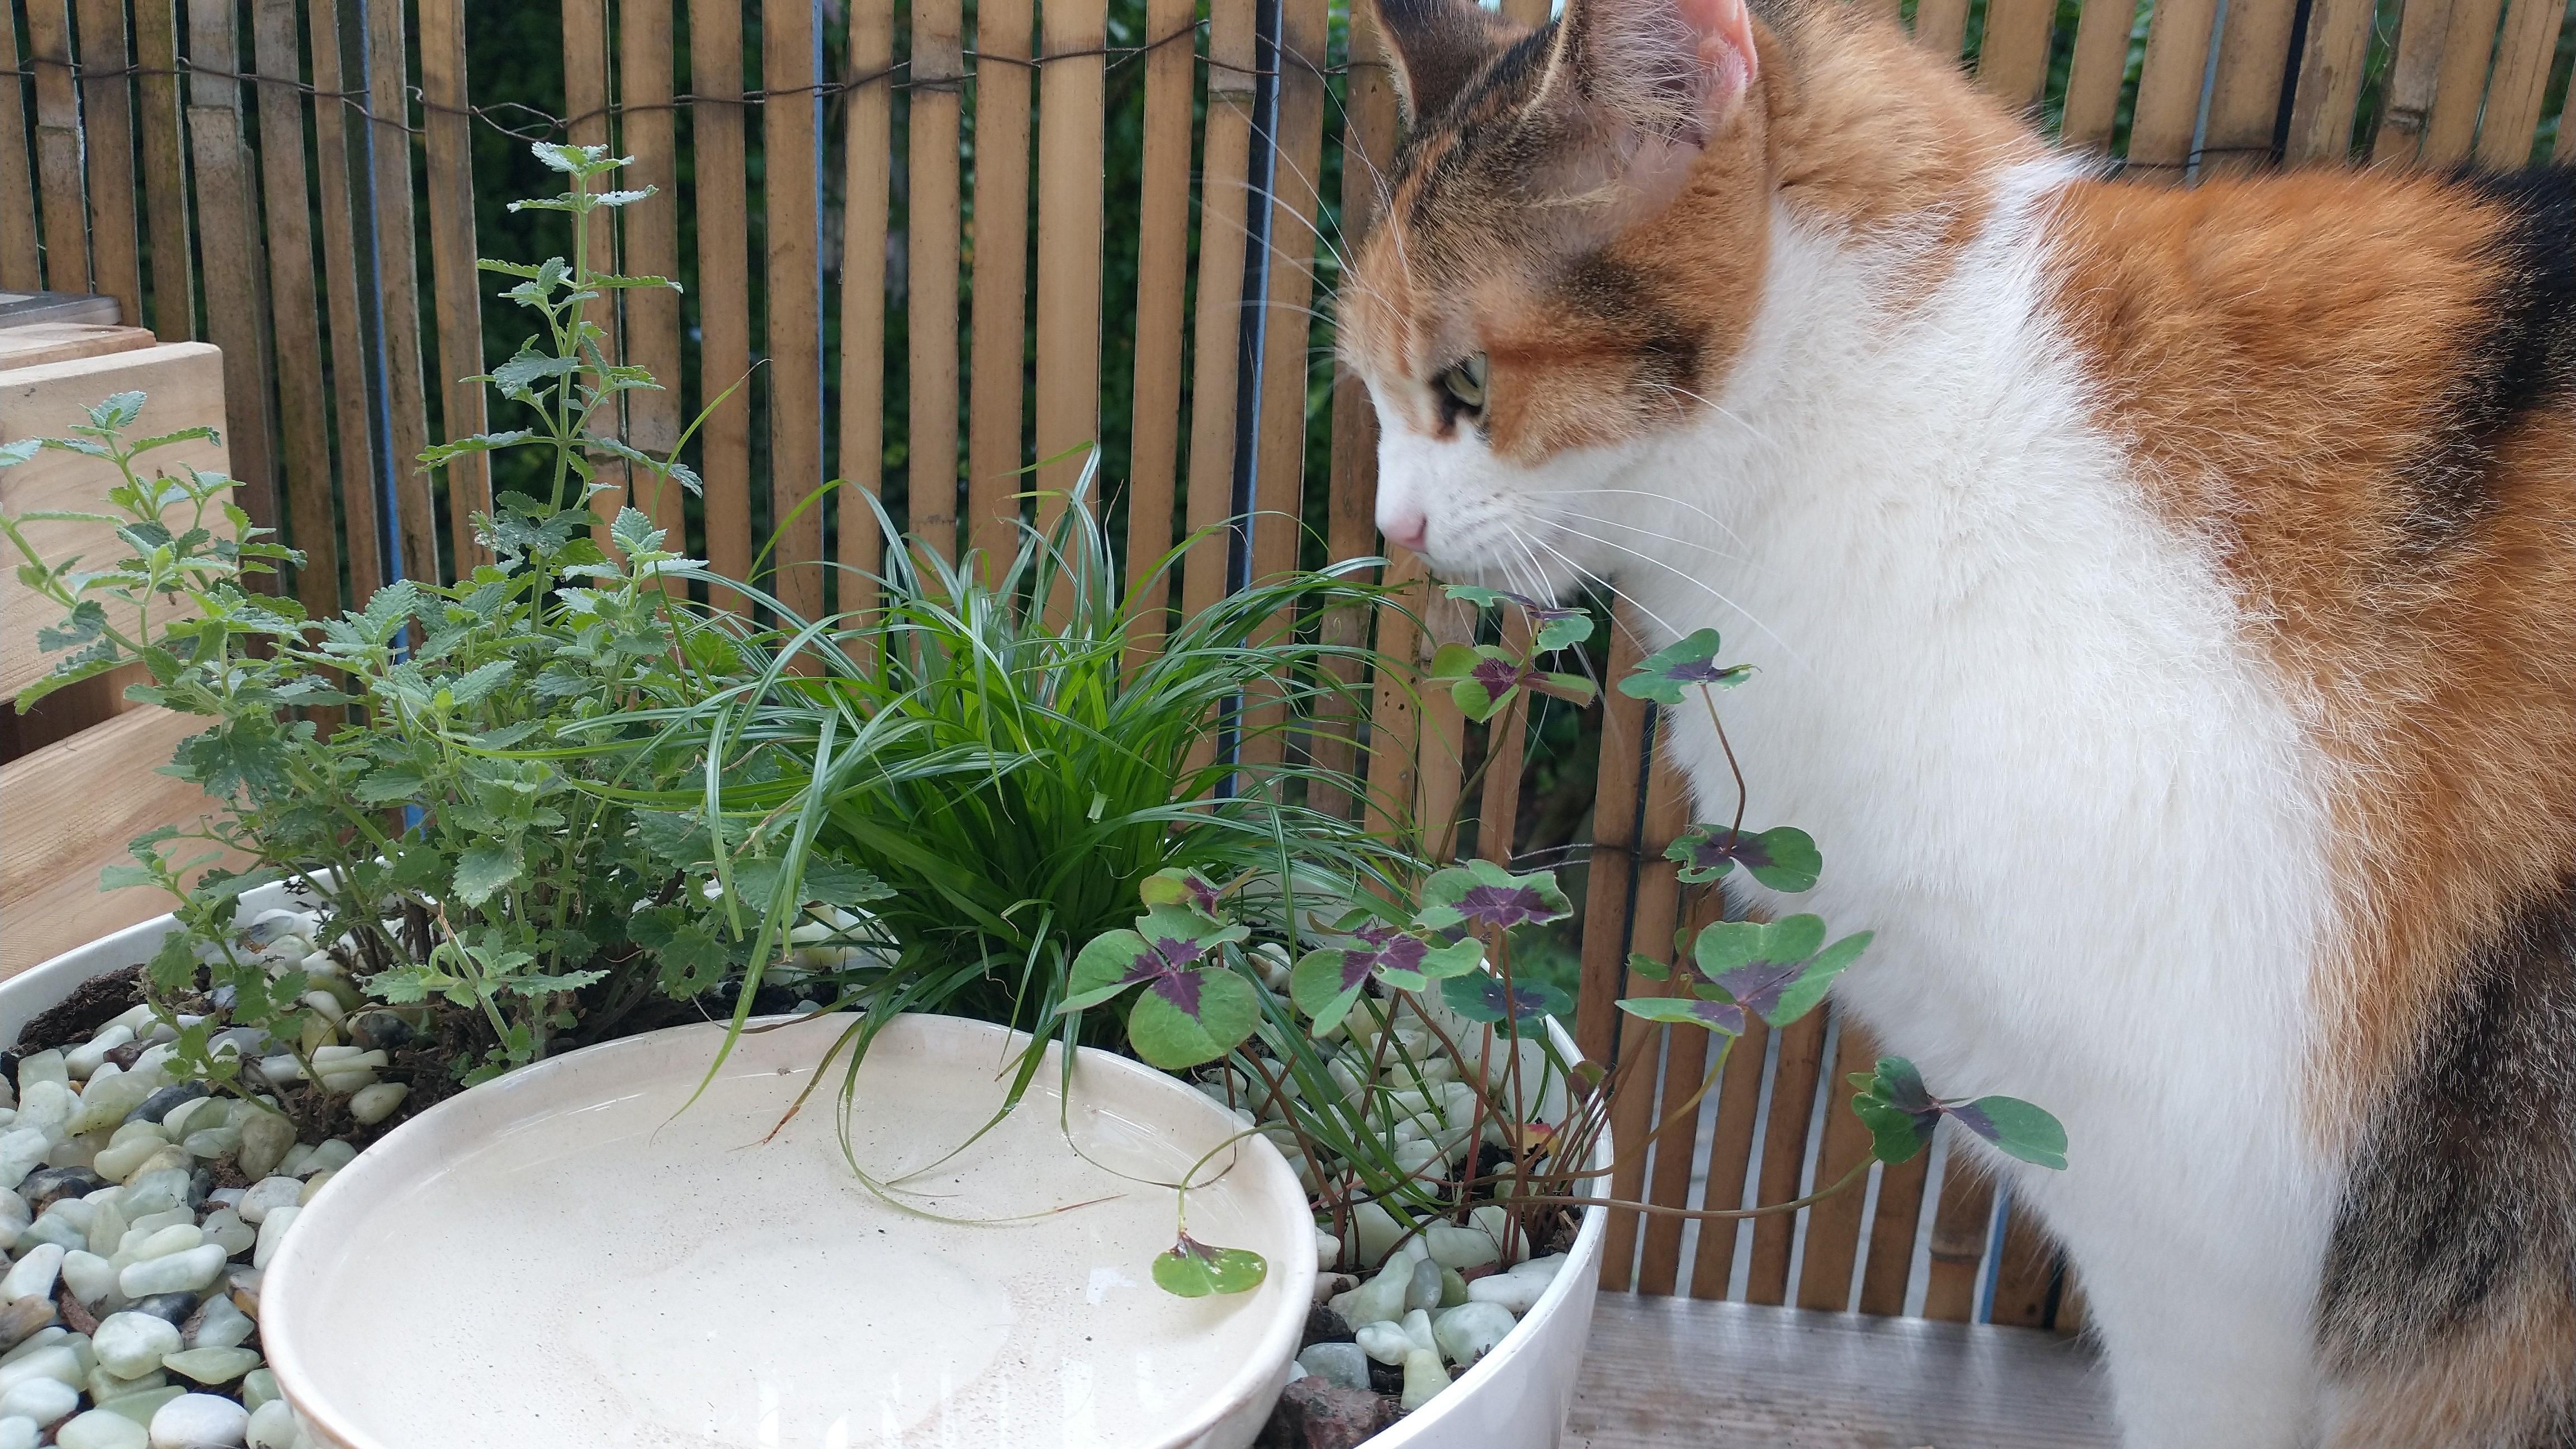 Cat on balcony with decorative cat drinking garden.